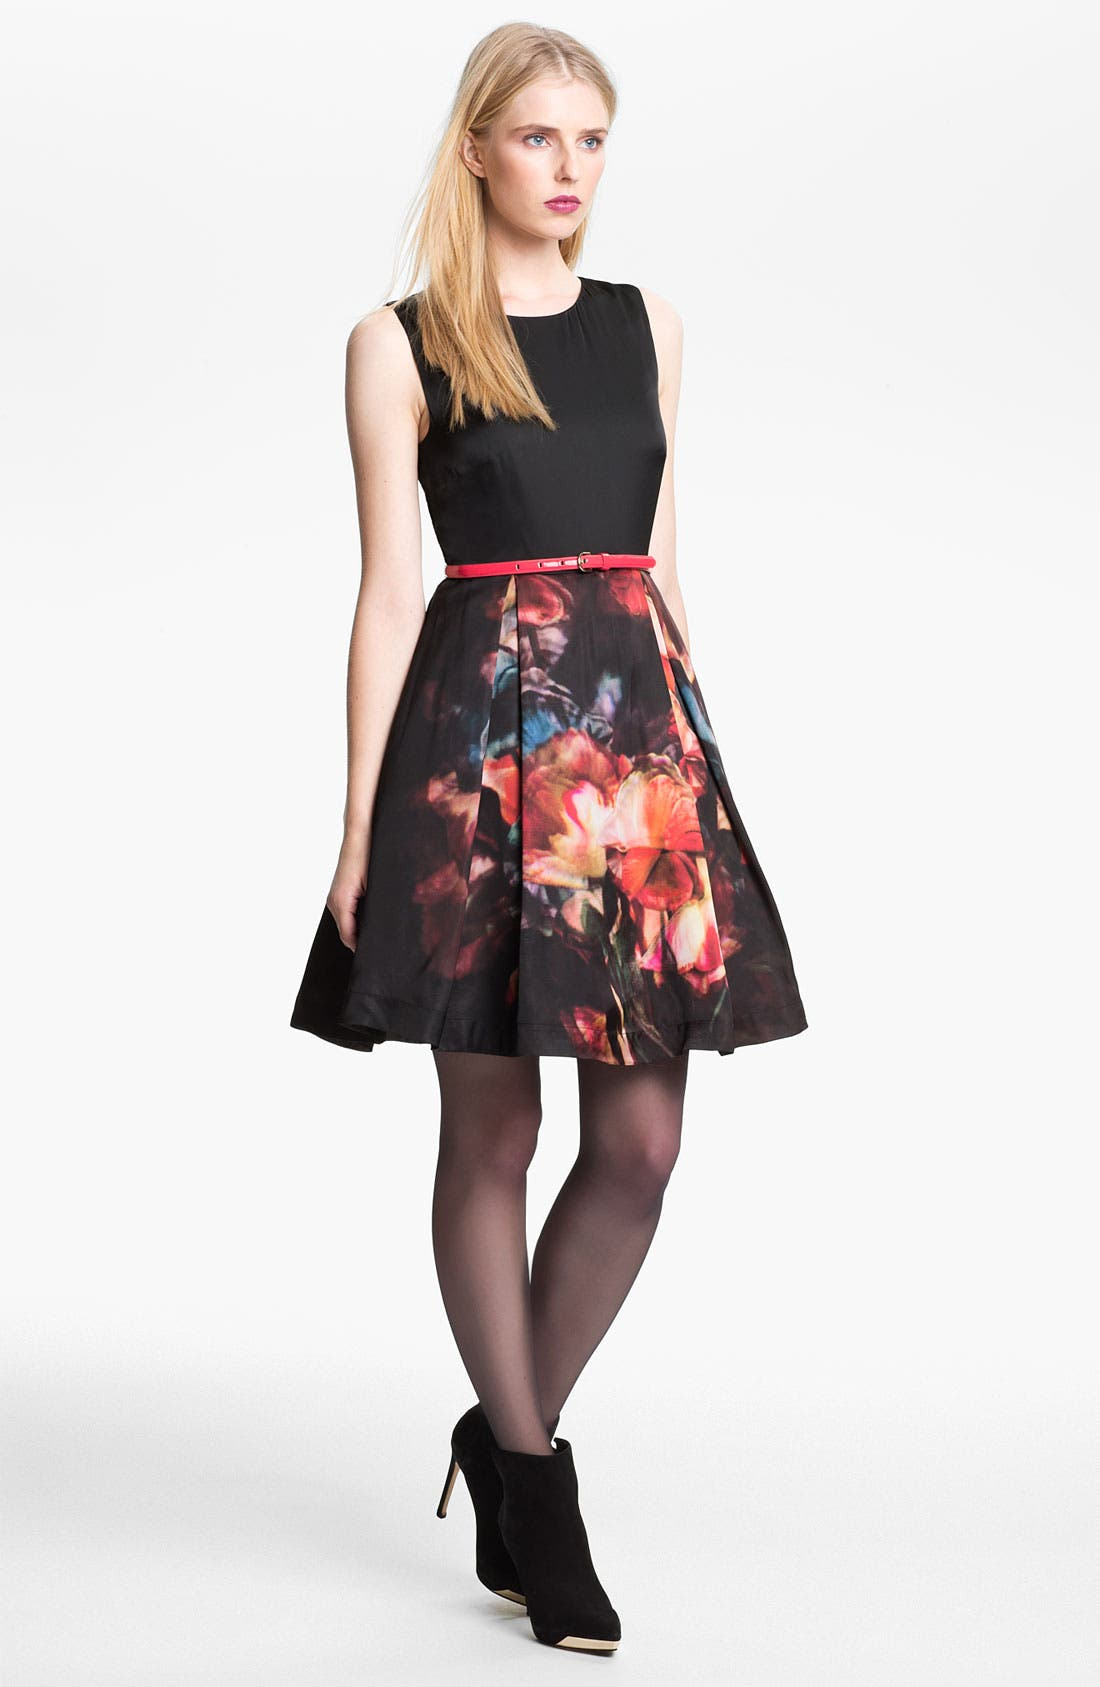 Alternate Image 1 Selected - Ted Baker London 'Marinka' Belted Fit & Flare Dress